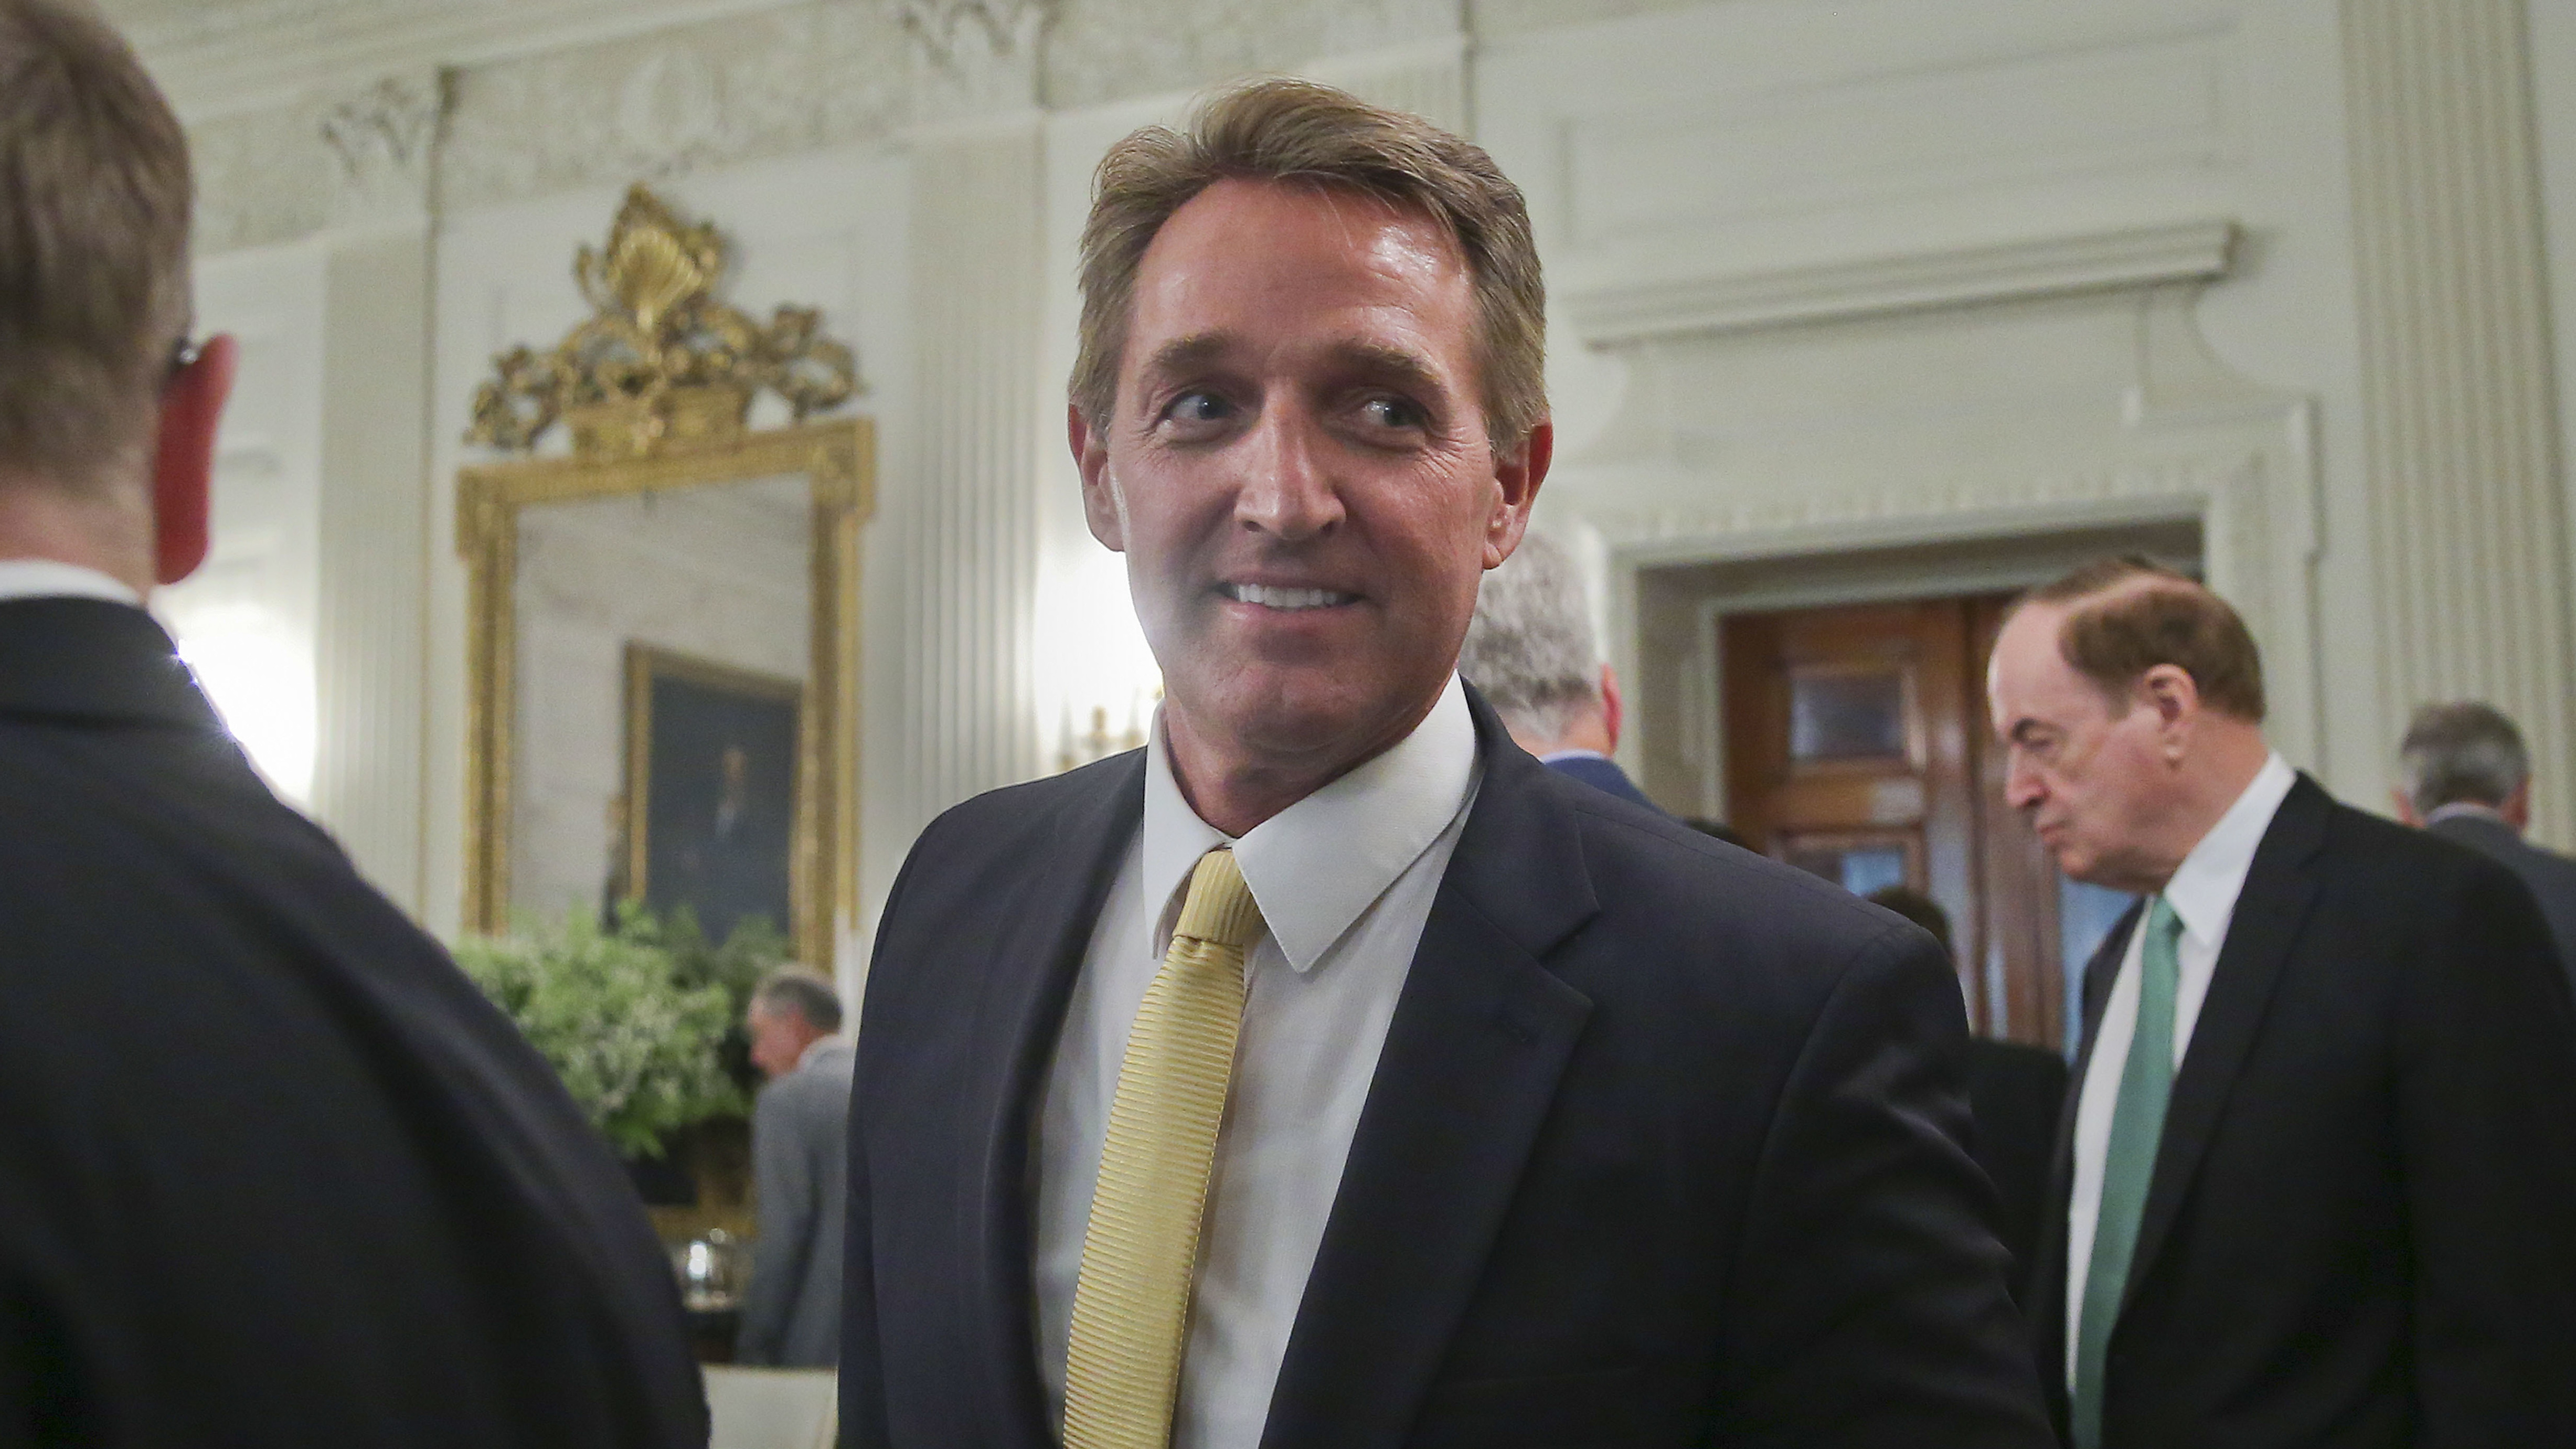 Sen. Flake faults GOP, Democrat partisanship for Trump rise